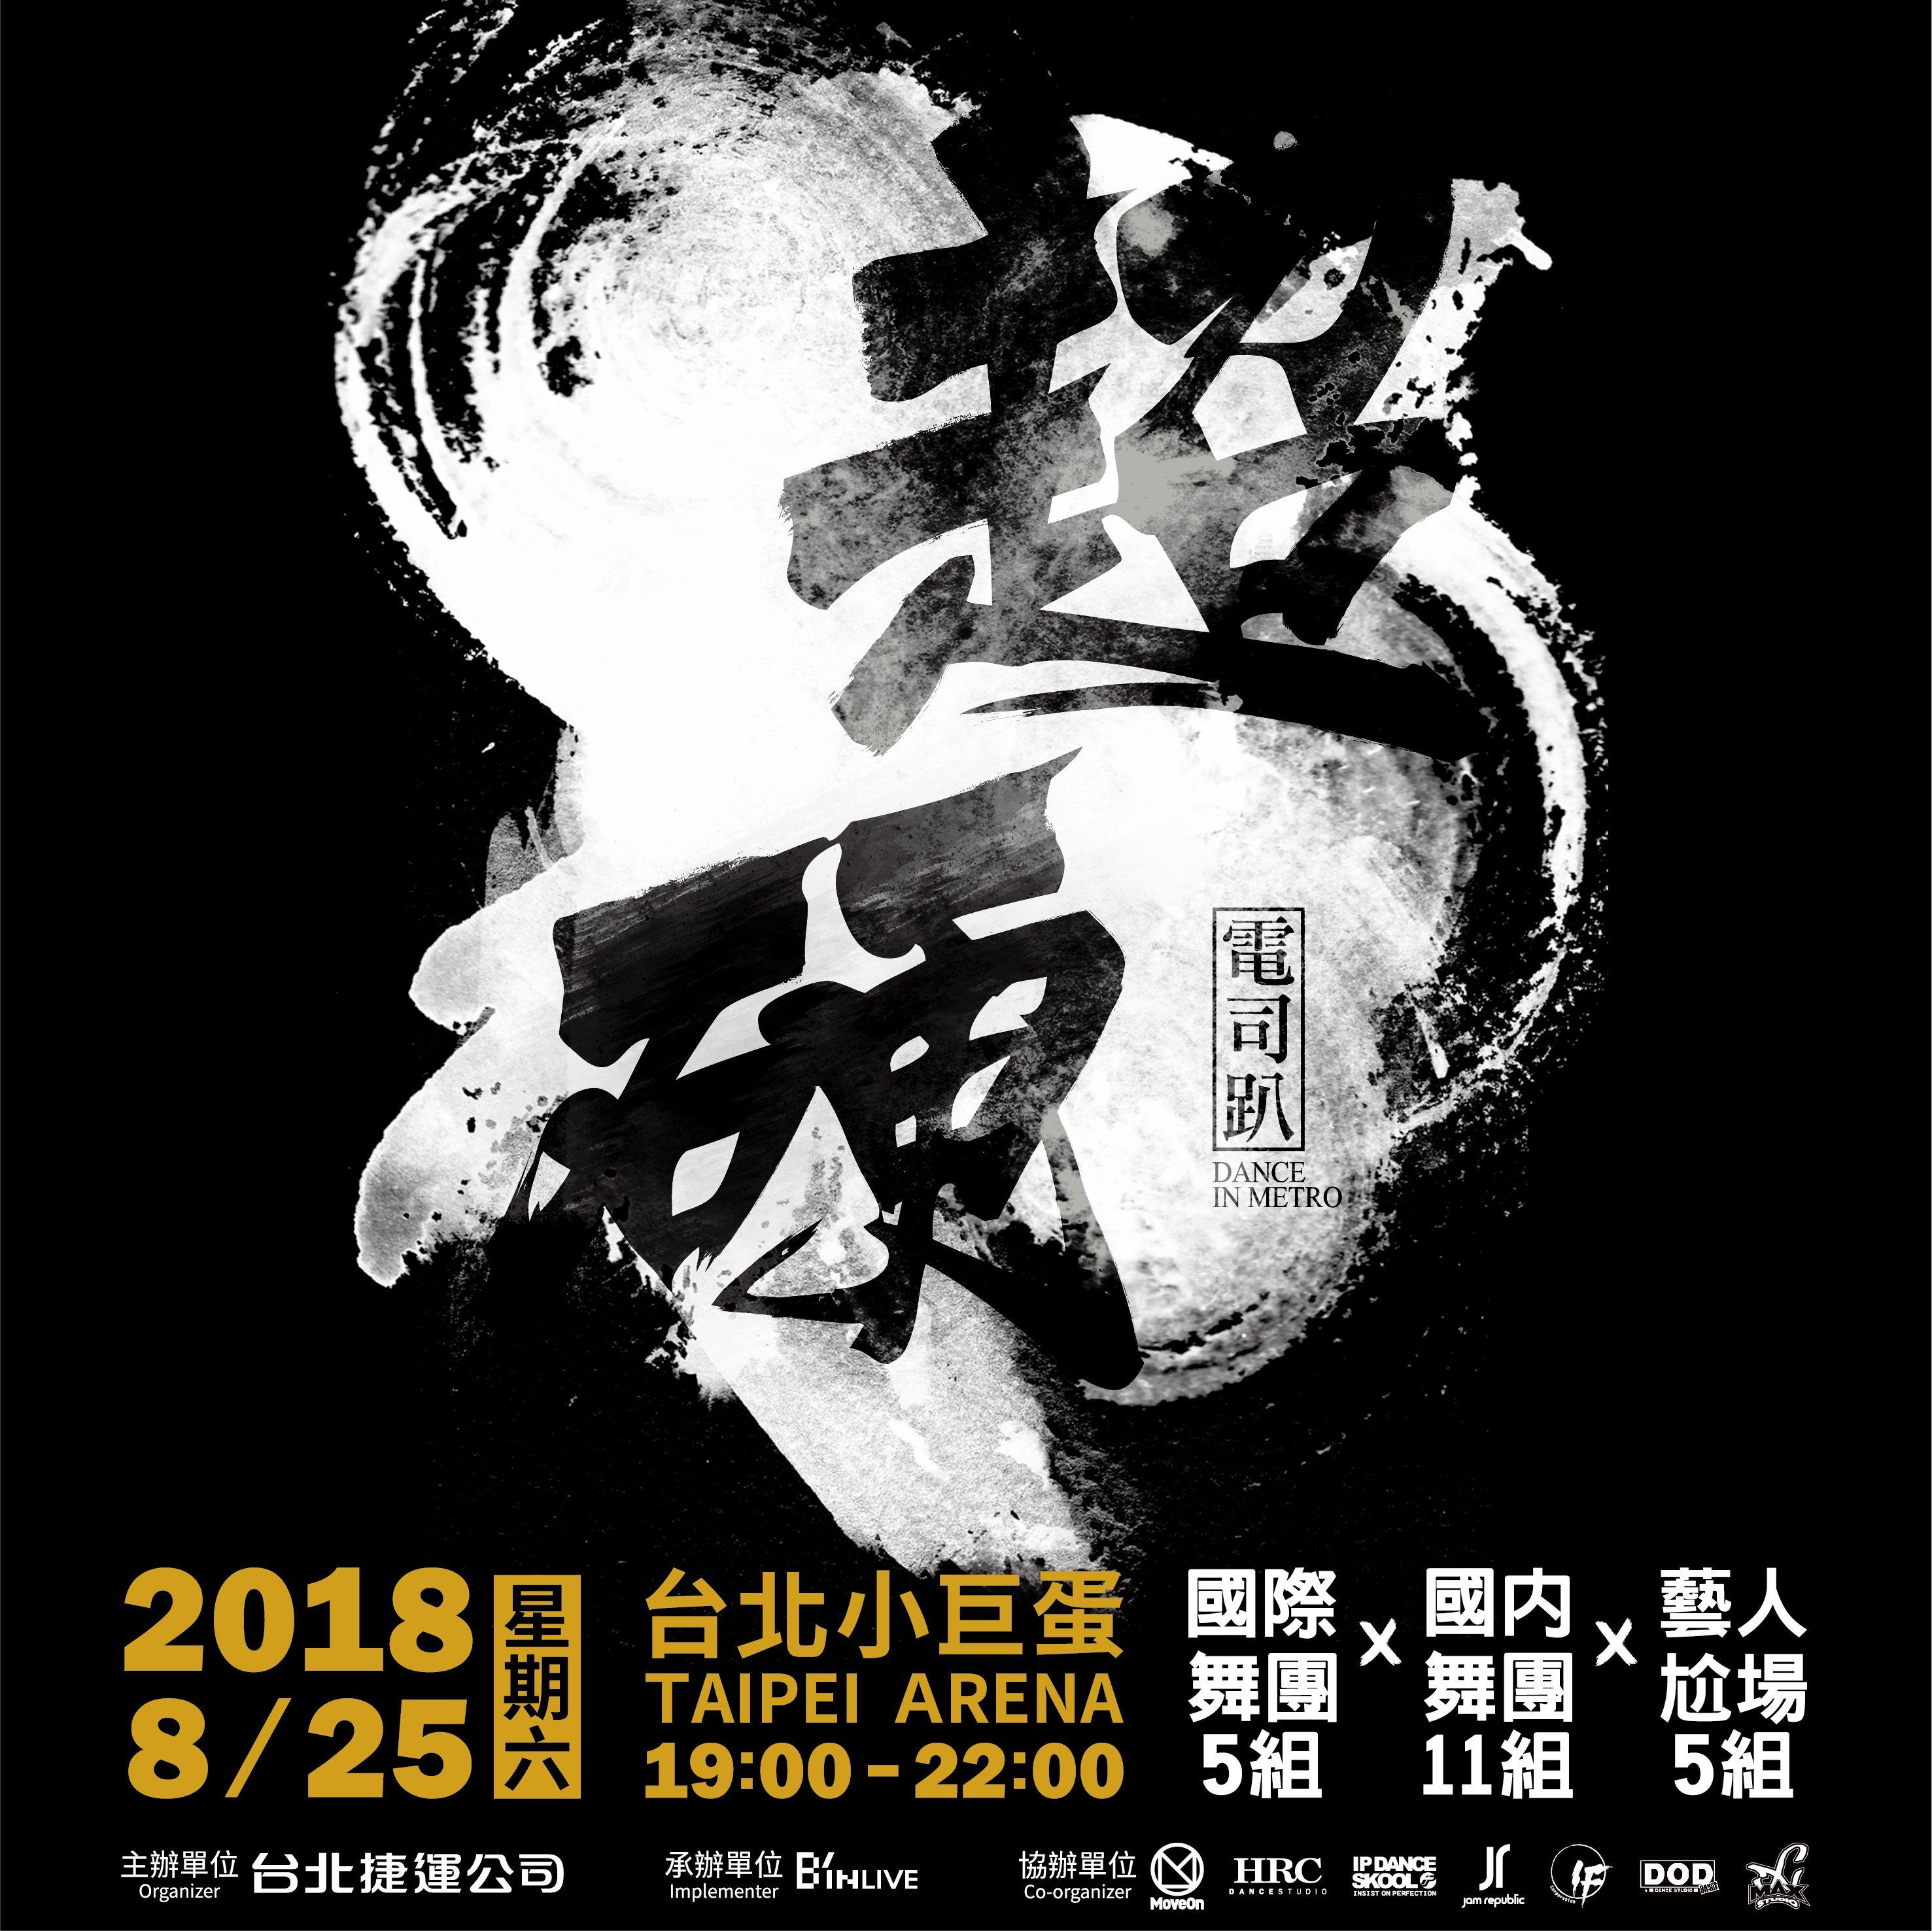 08 >> Taipei Arena Past Events 2018 08 25 Dance In Metro